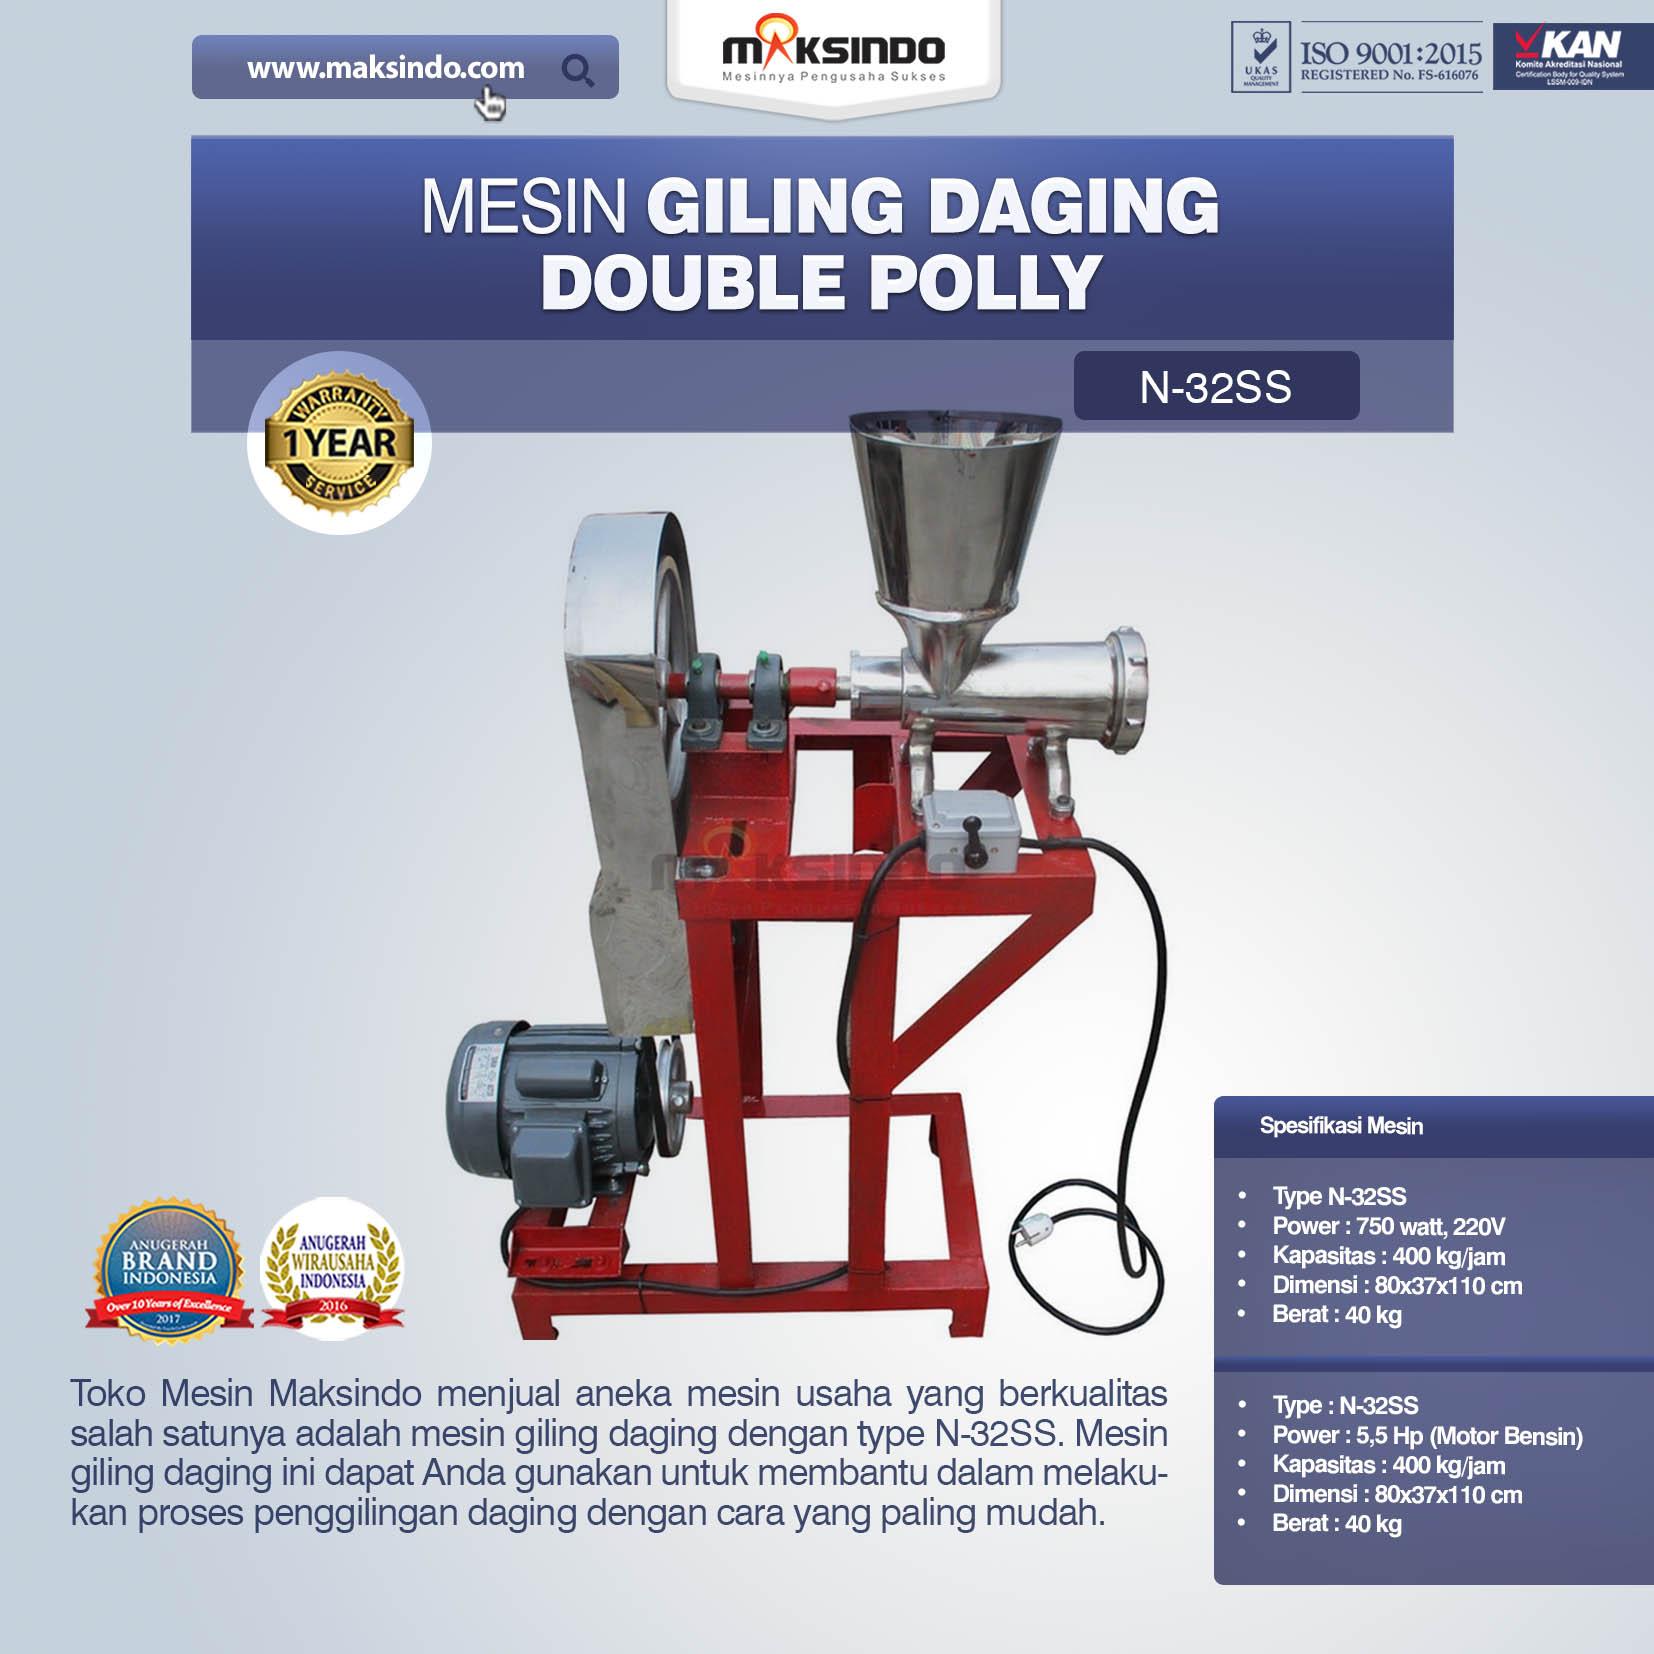 Jual Mesin Giling Daging Double Polly N-32SS di Mataram